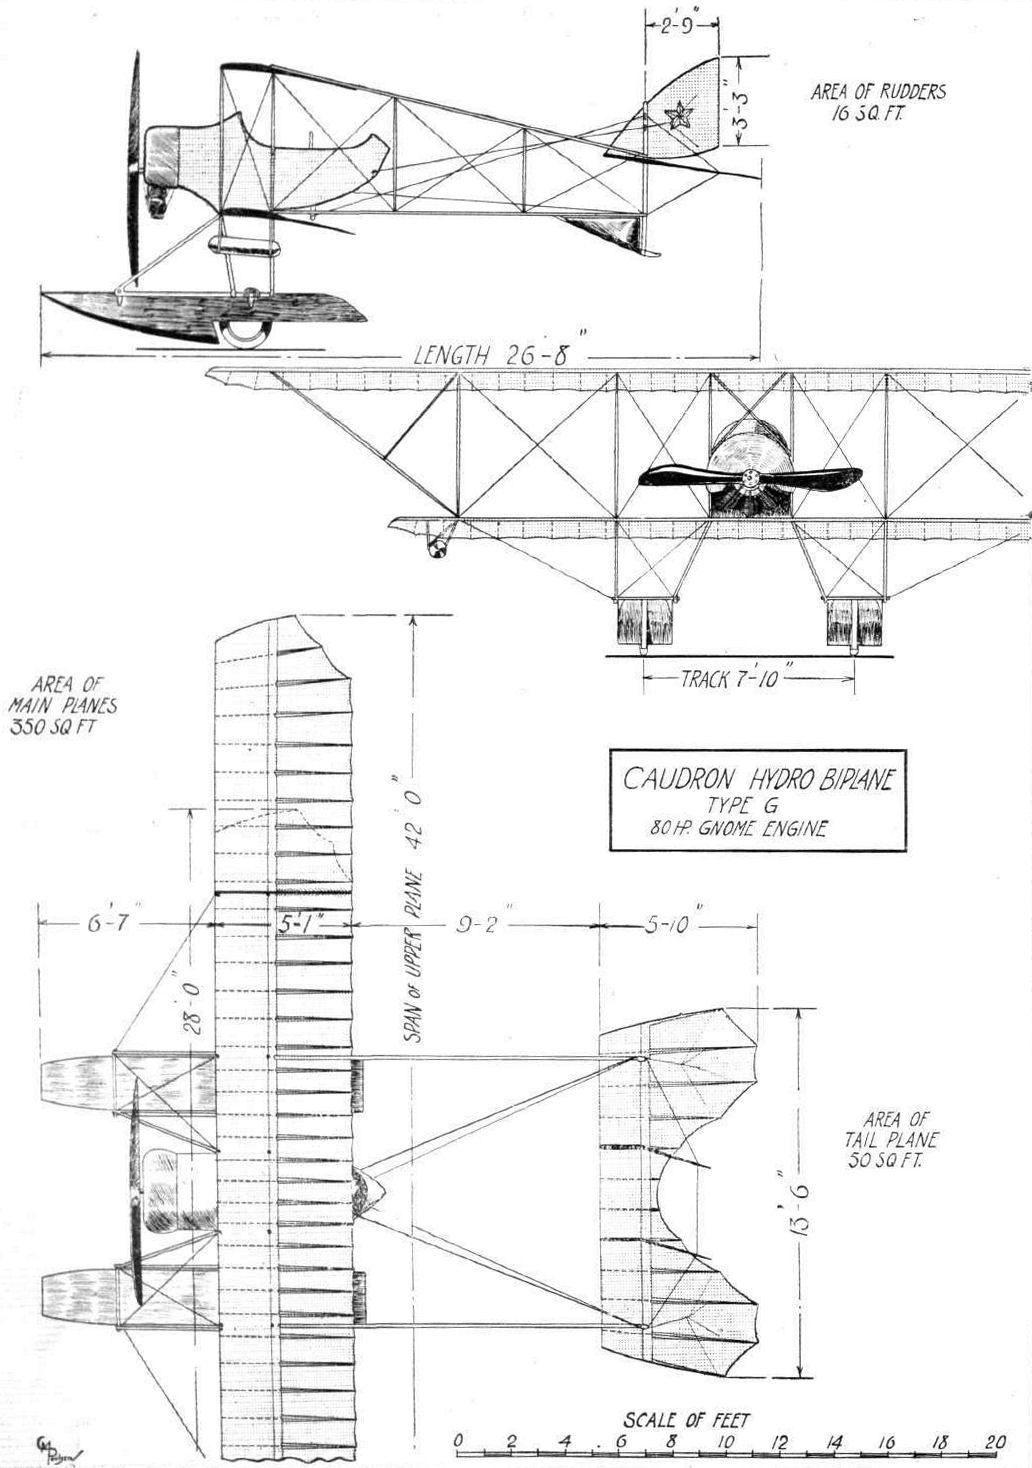 Caudron Type J blueprint